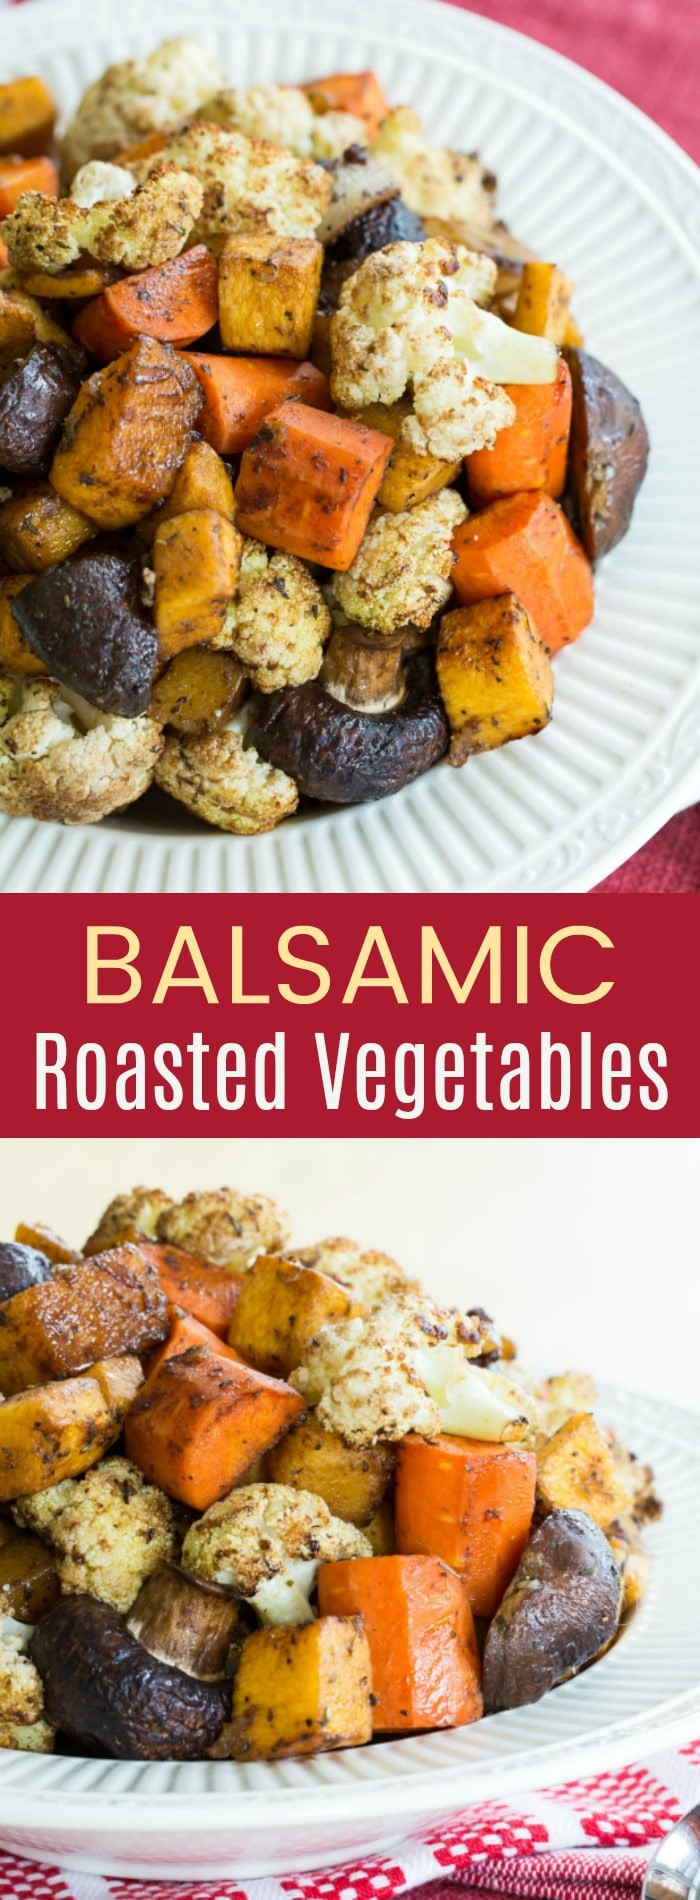 Balsamic Roasted Vegetables  Balsamic Roasted Ve ables